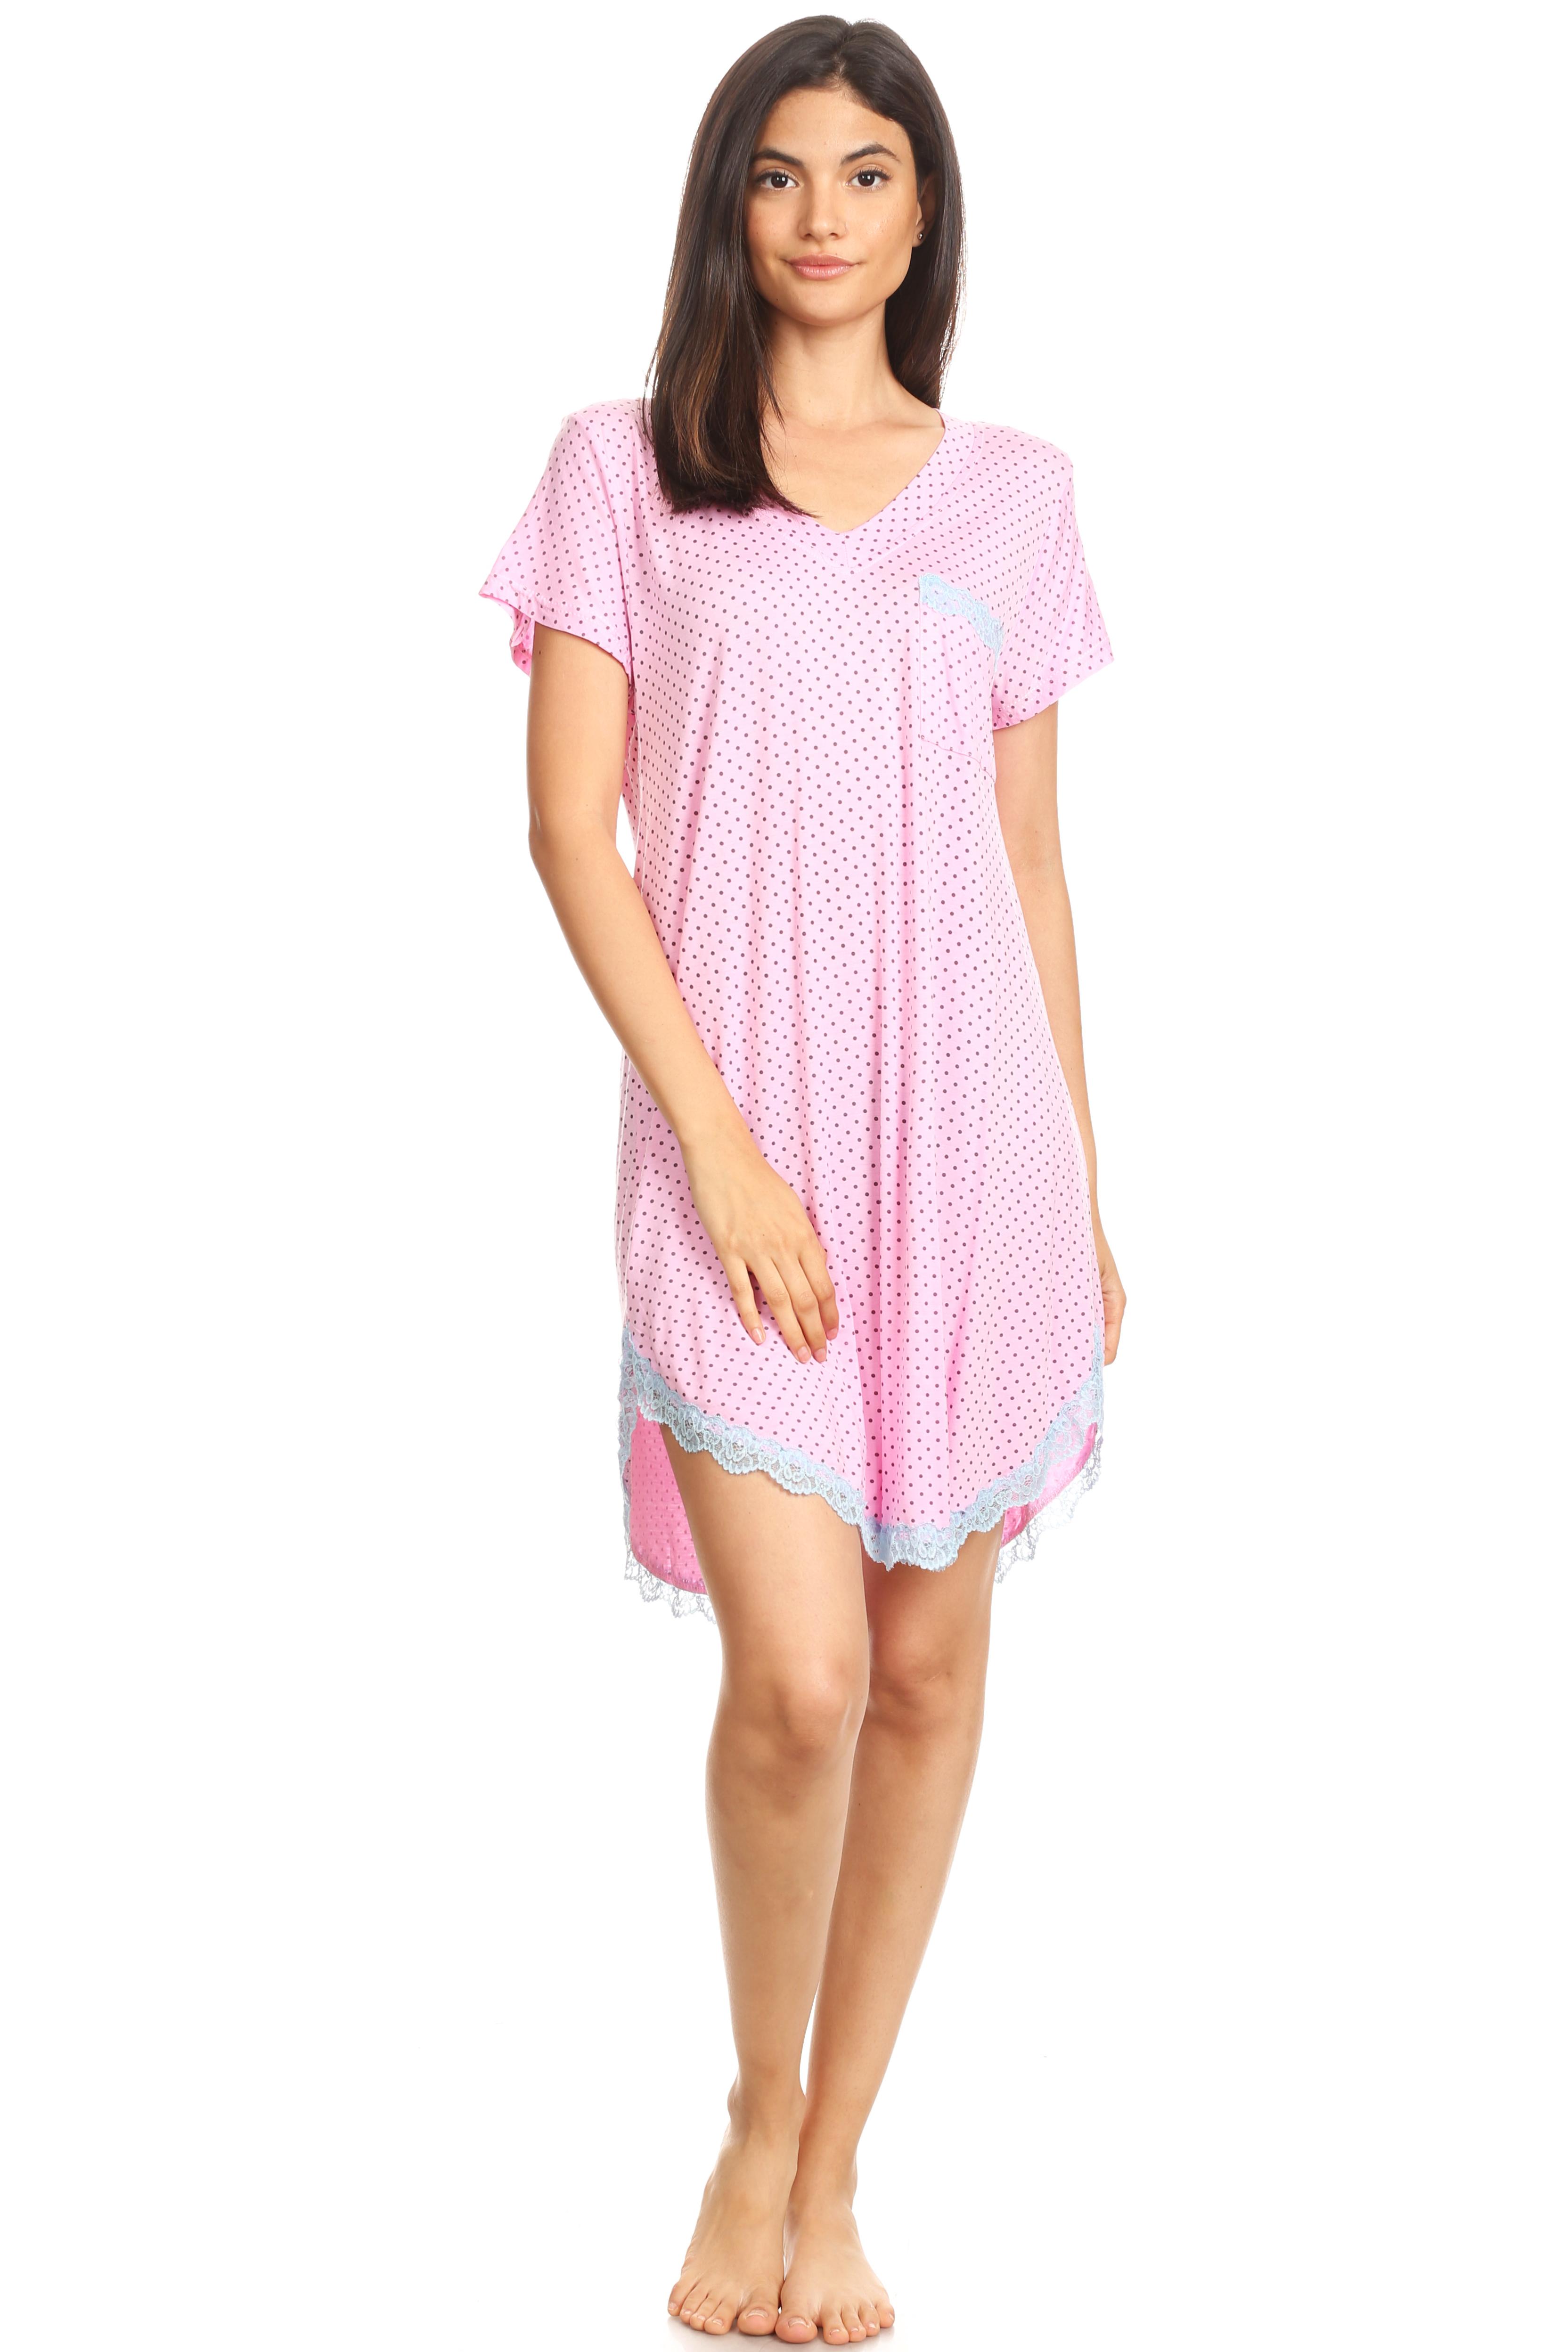 301 Womens Nightgown Sleepwear Pajamas - Woman Sleeveless Sleep Dress Nightshirt Gray L